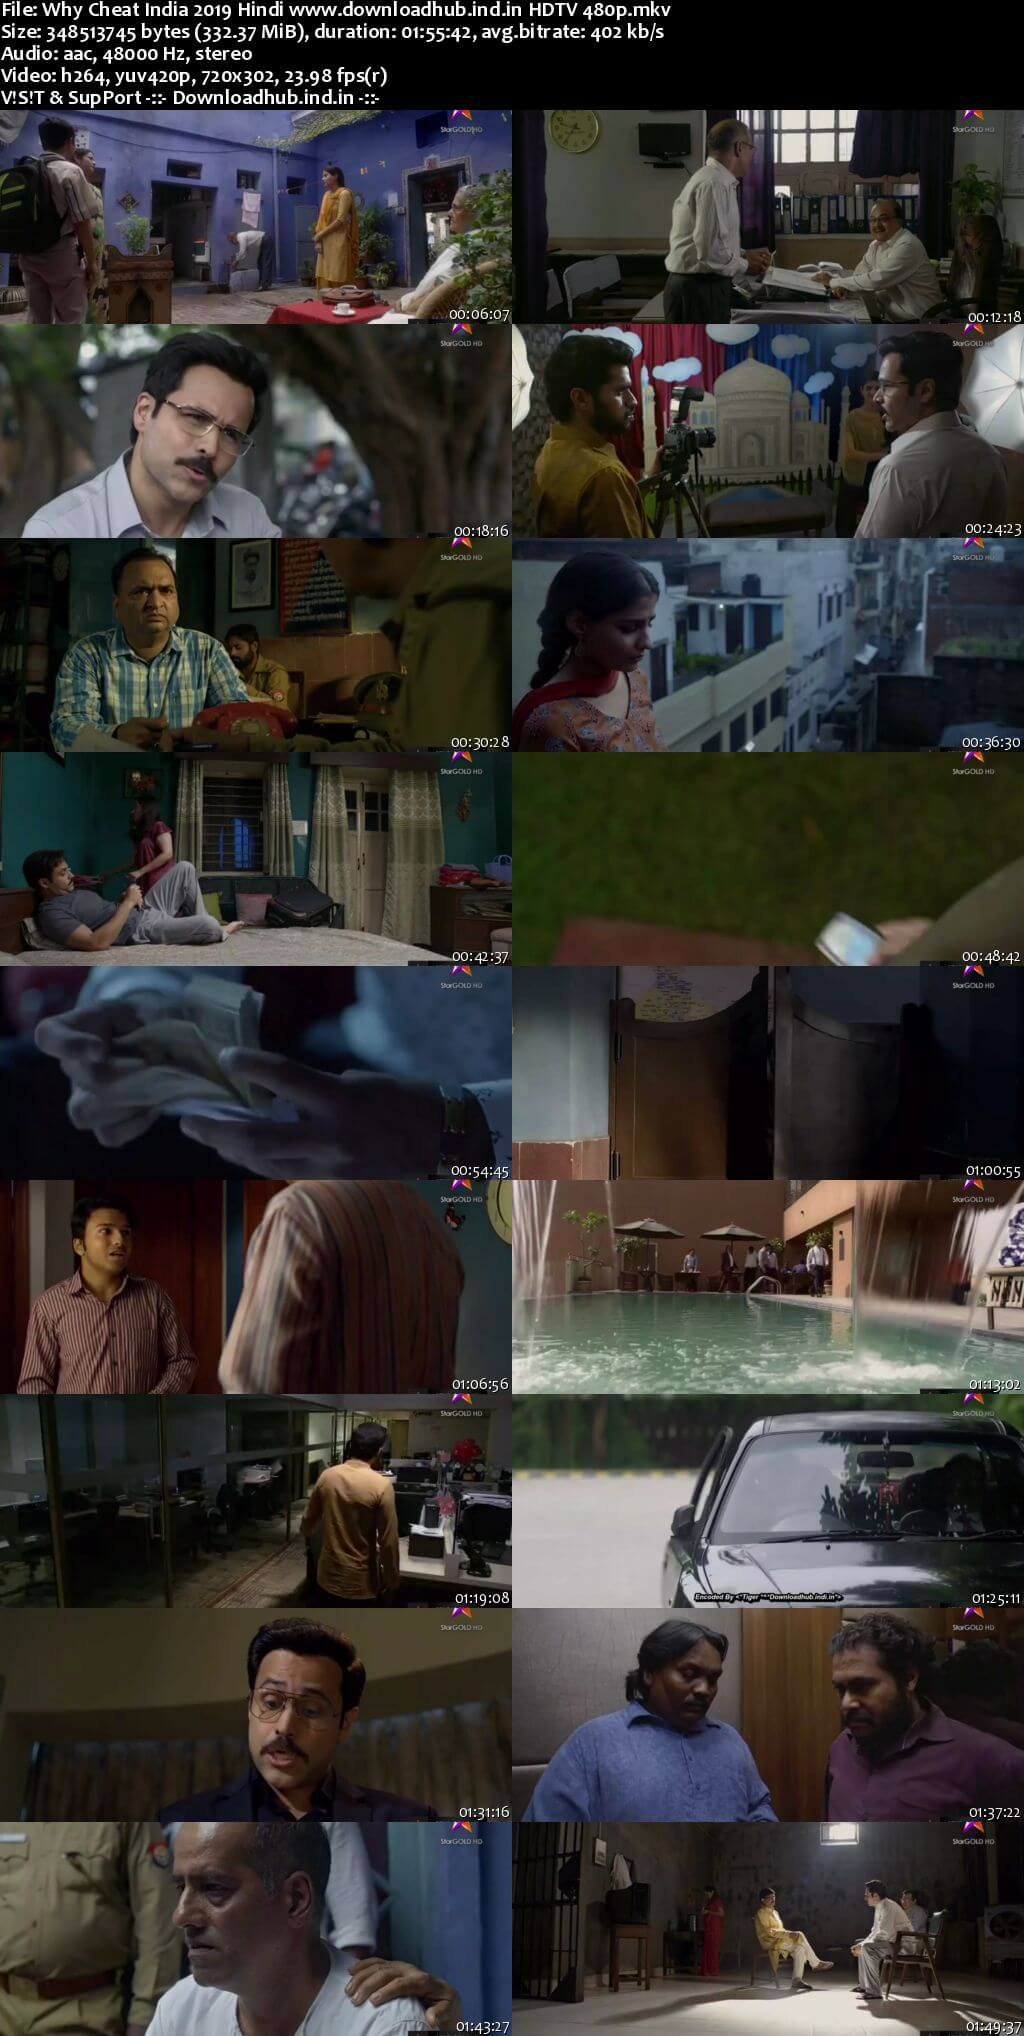 Why Cheat India 2019 Hindi 300MB HDTV 480p